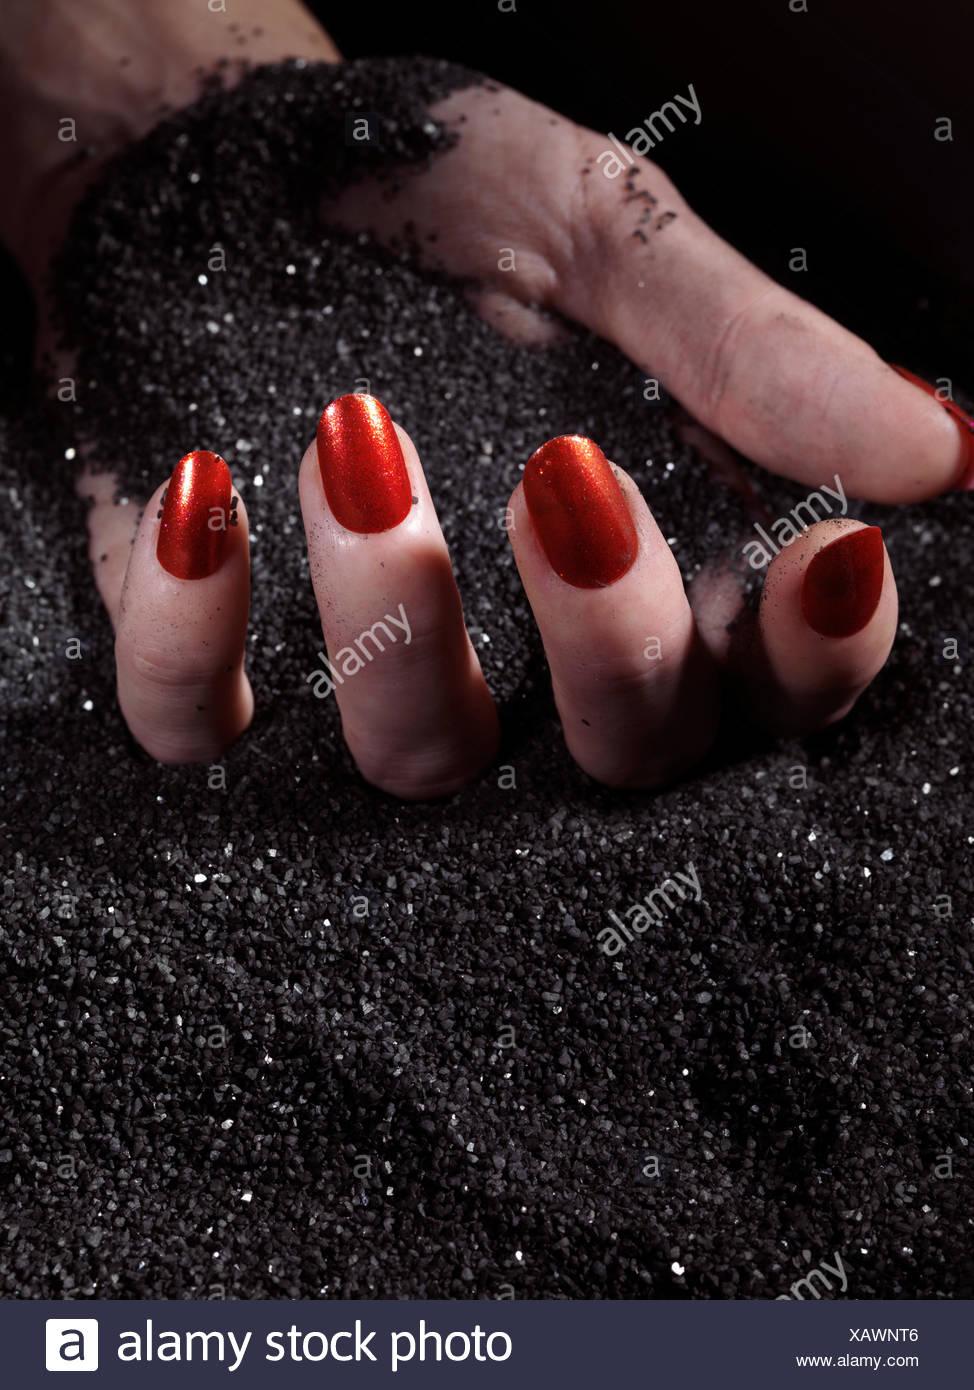 Black Fingernail Polish Stockfotos & Black Fingernail Polish Bilder ...